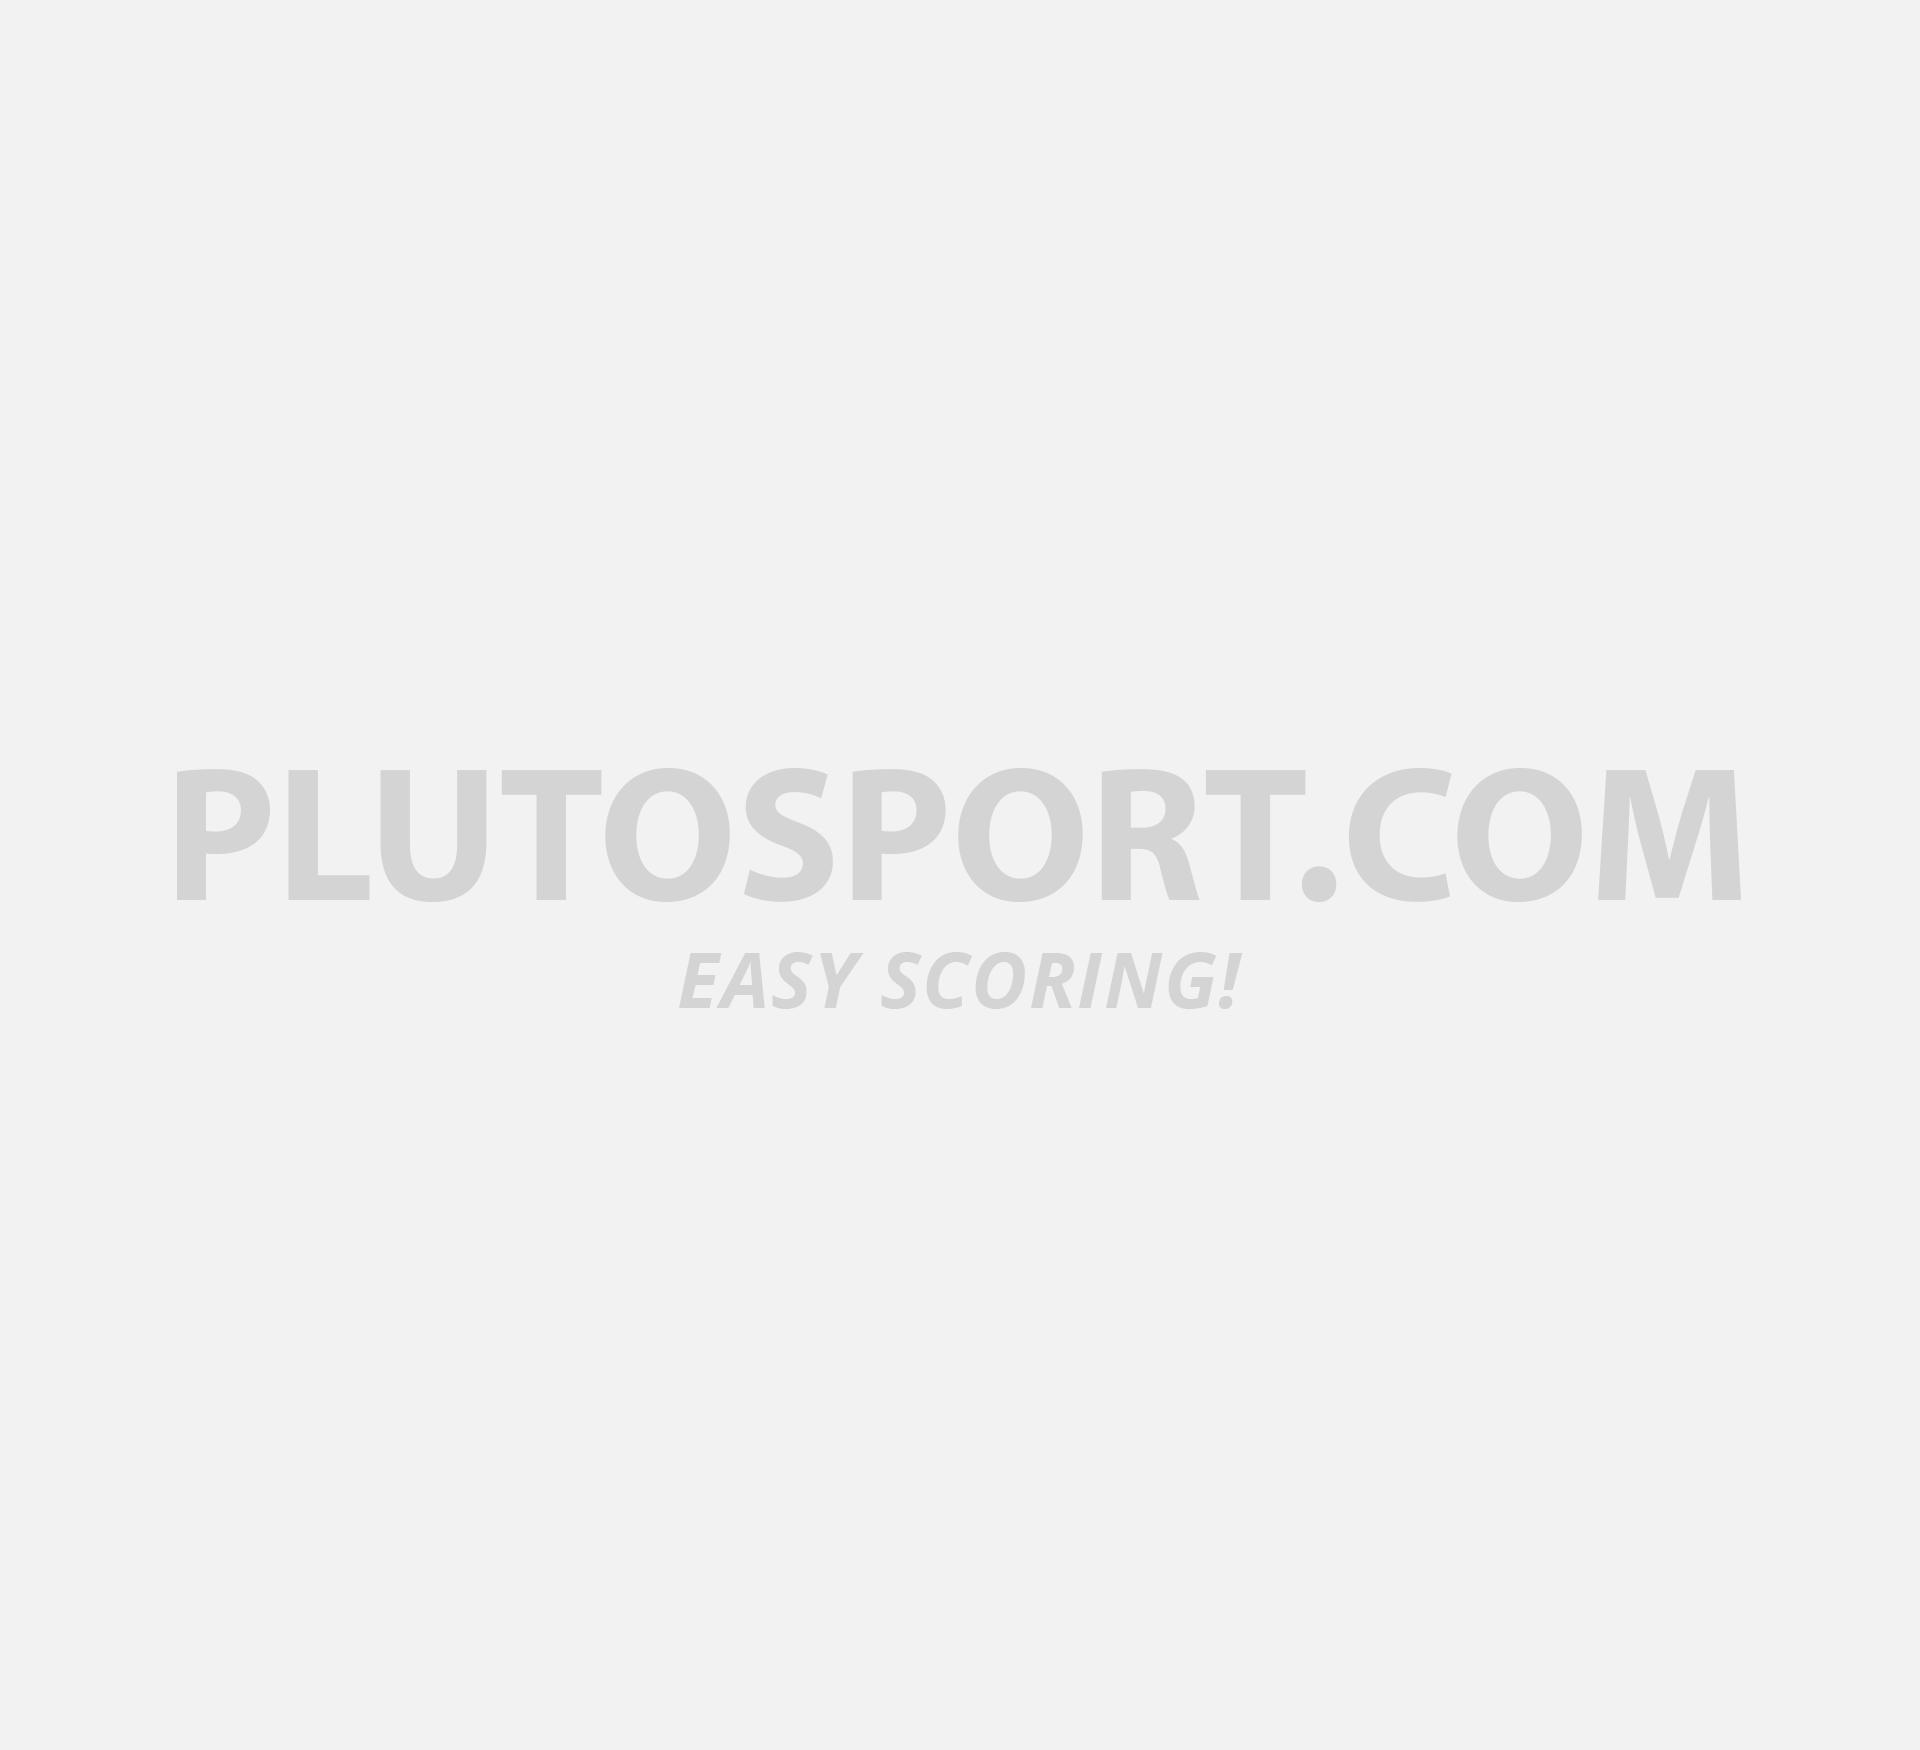 24bce3085d9 Nike Downshifter 5 MSL runningshoe Men - Neutral - Shoes - Running ...